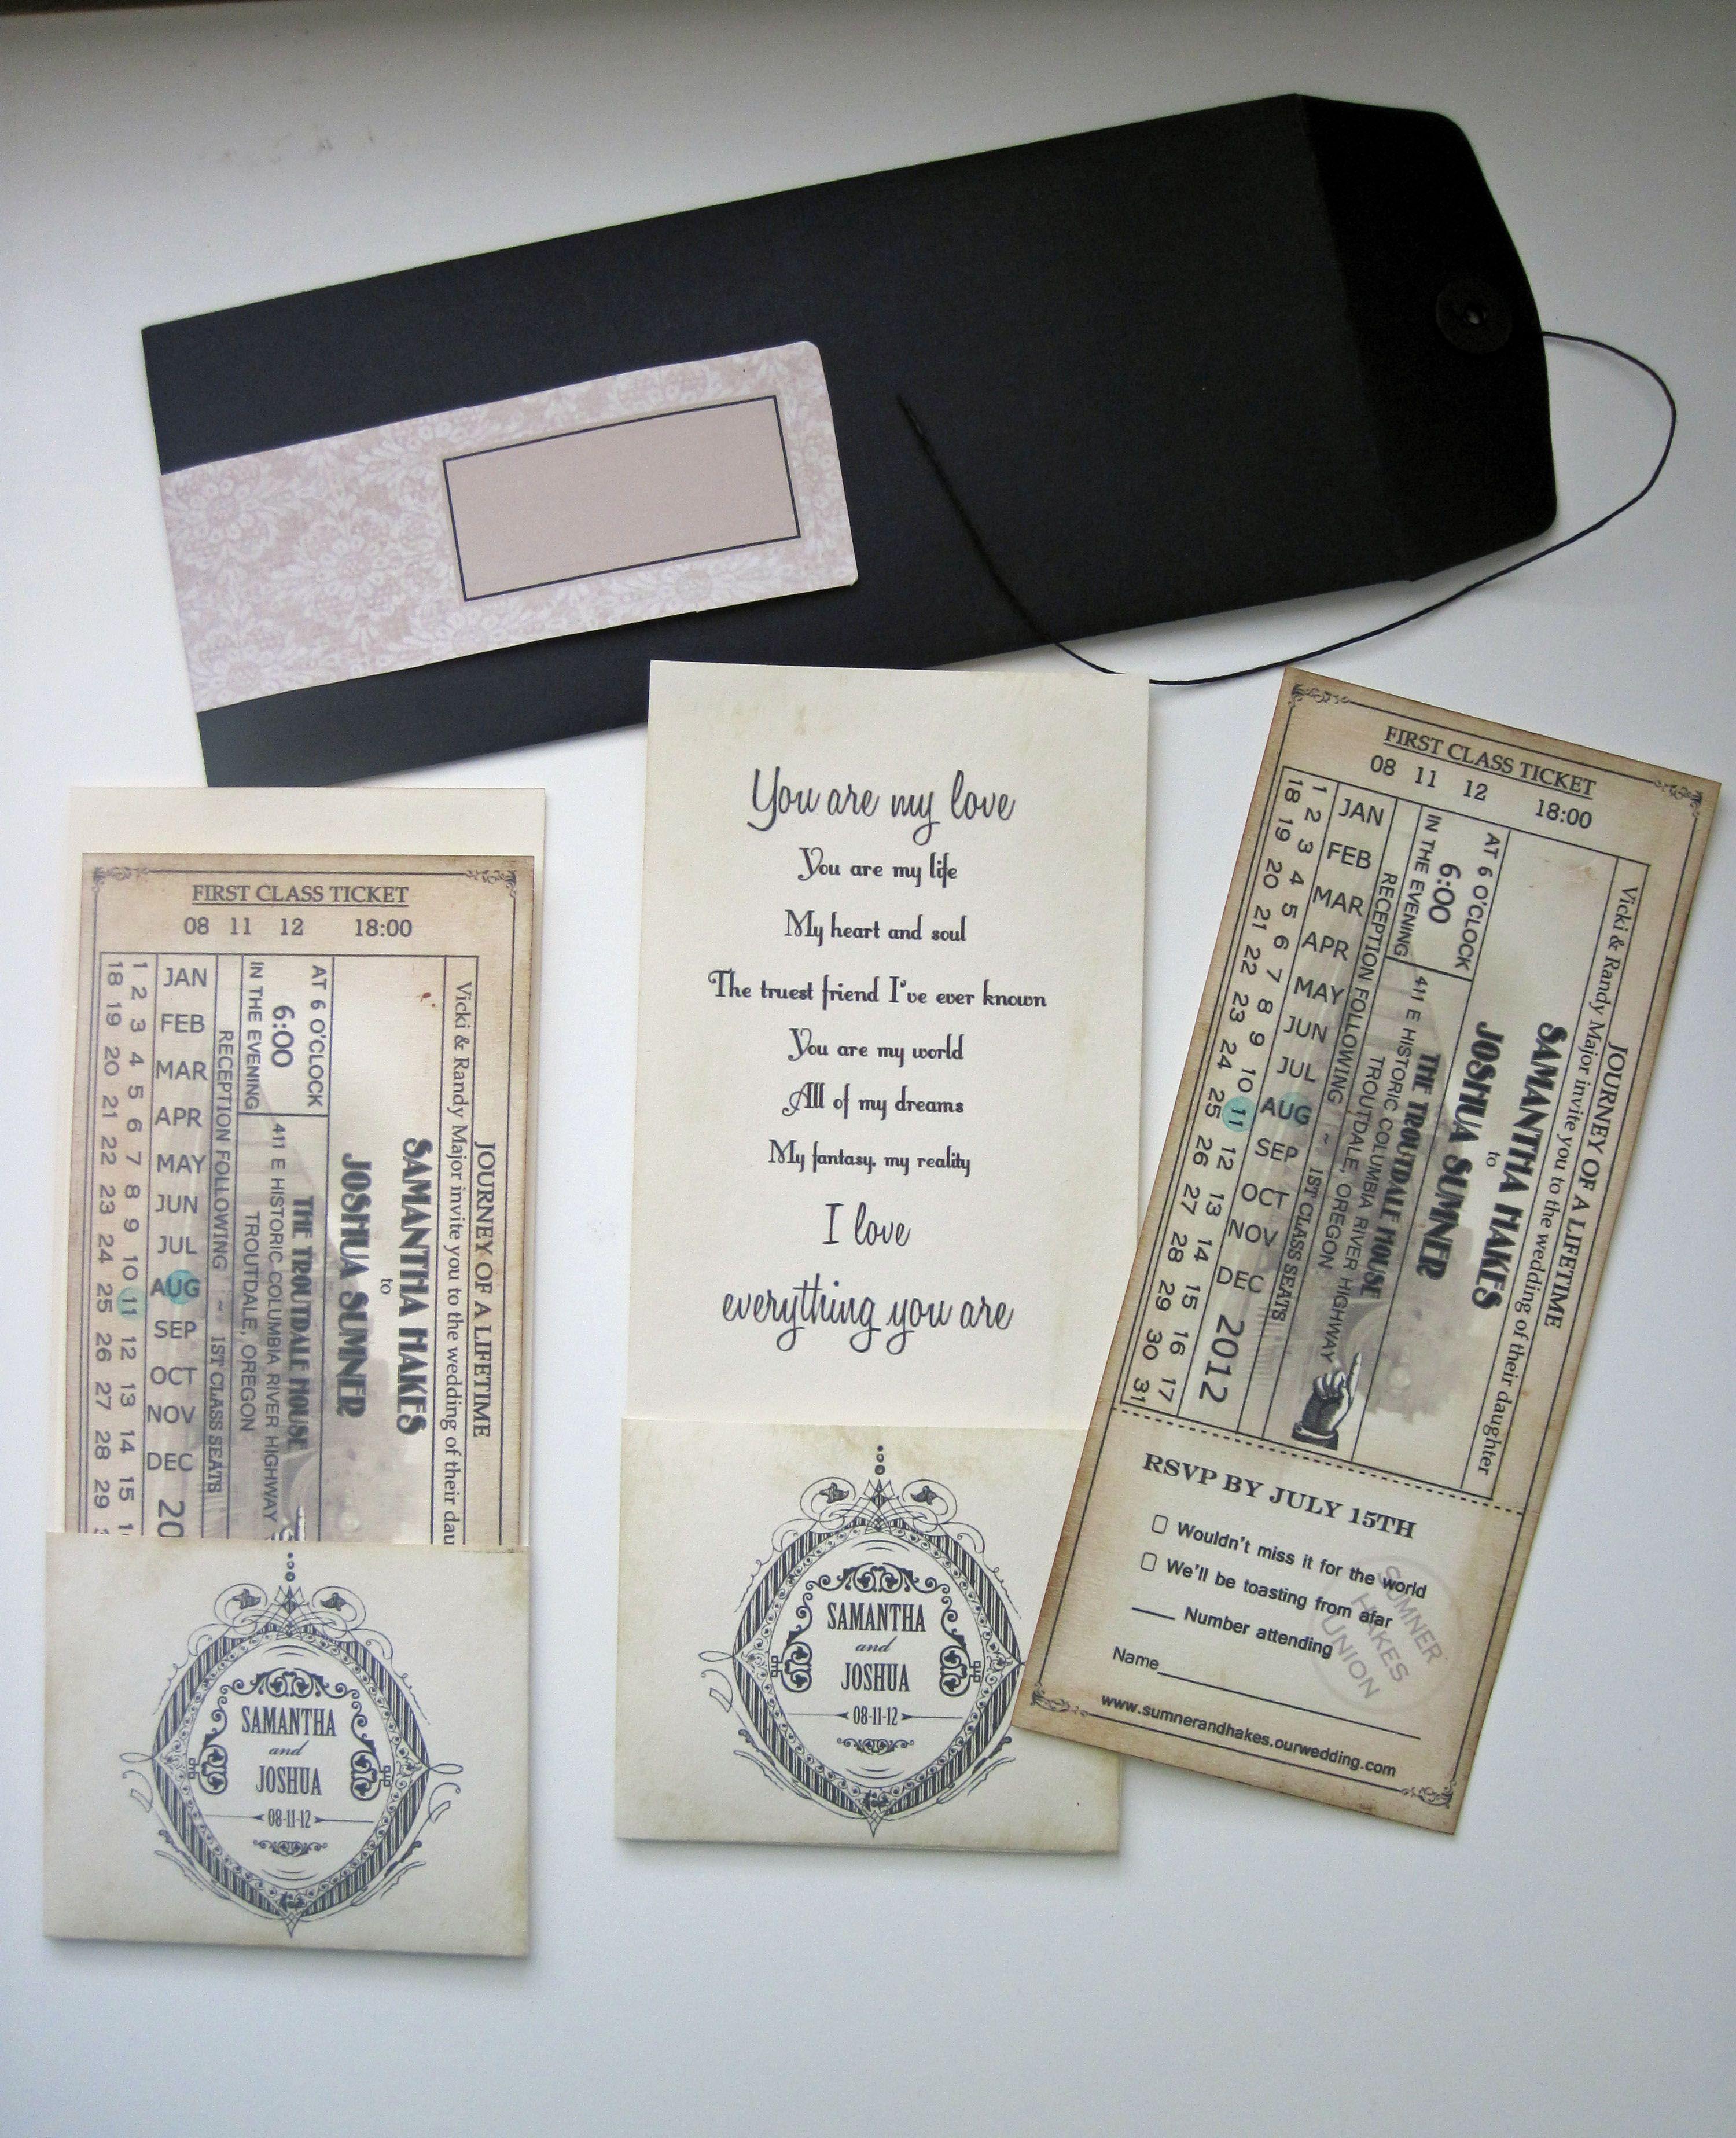 Wedding Invitation - Train ticket with tear off stub for RSVP ...